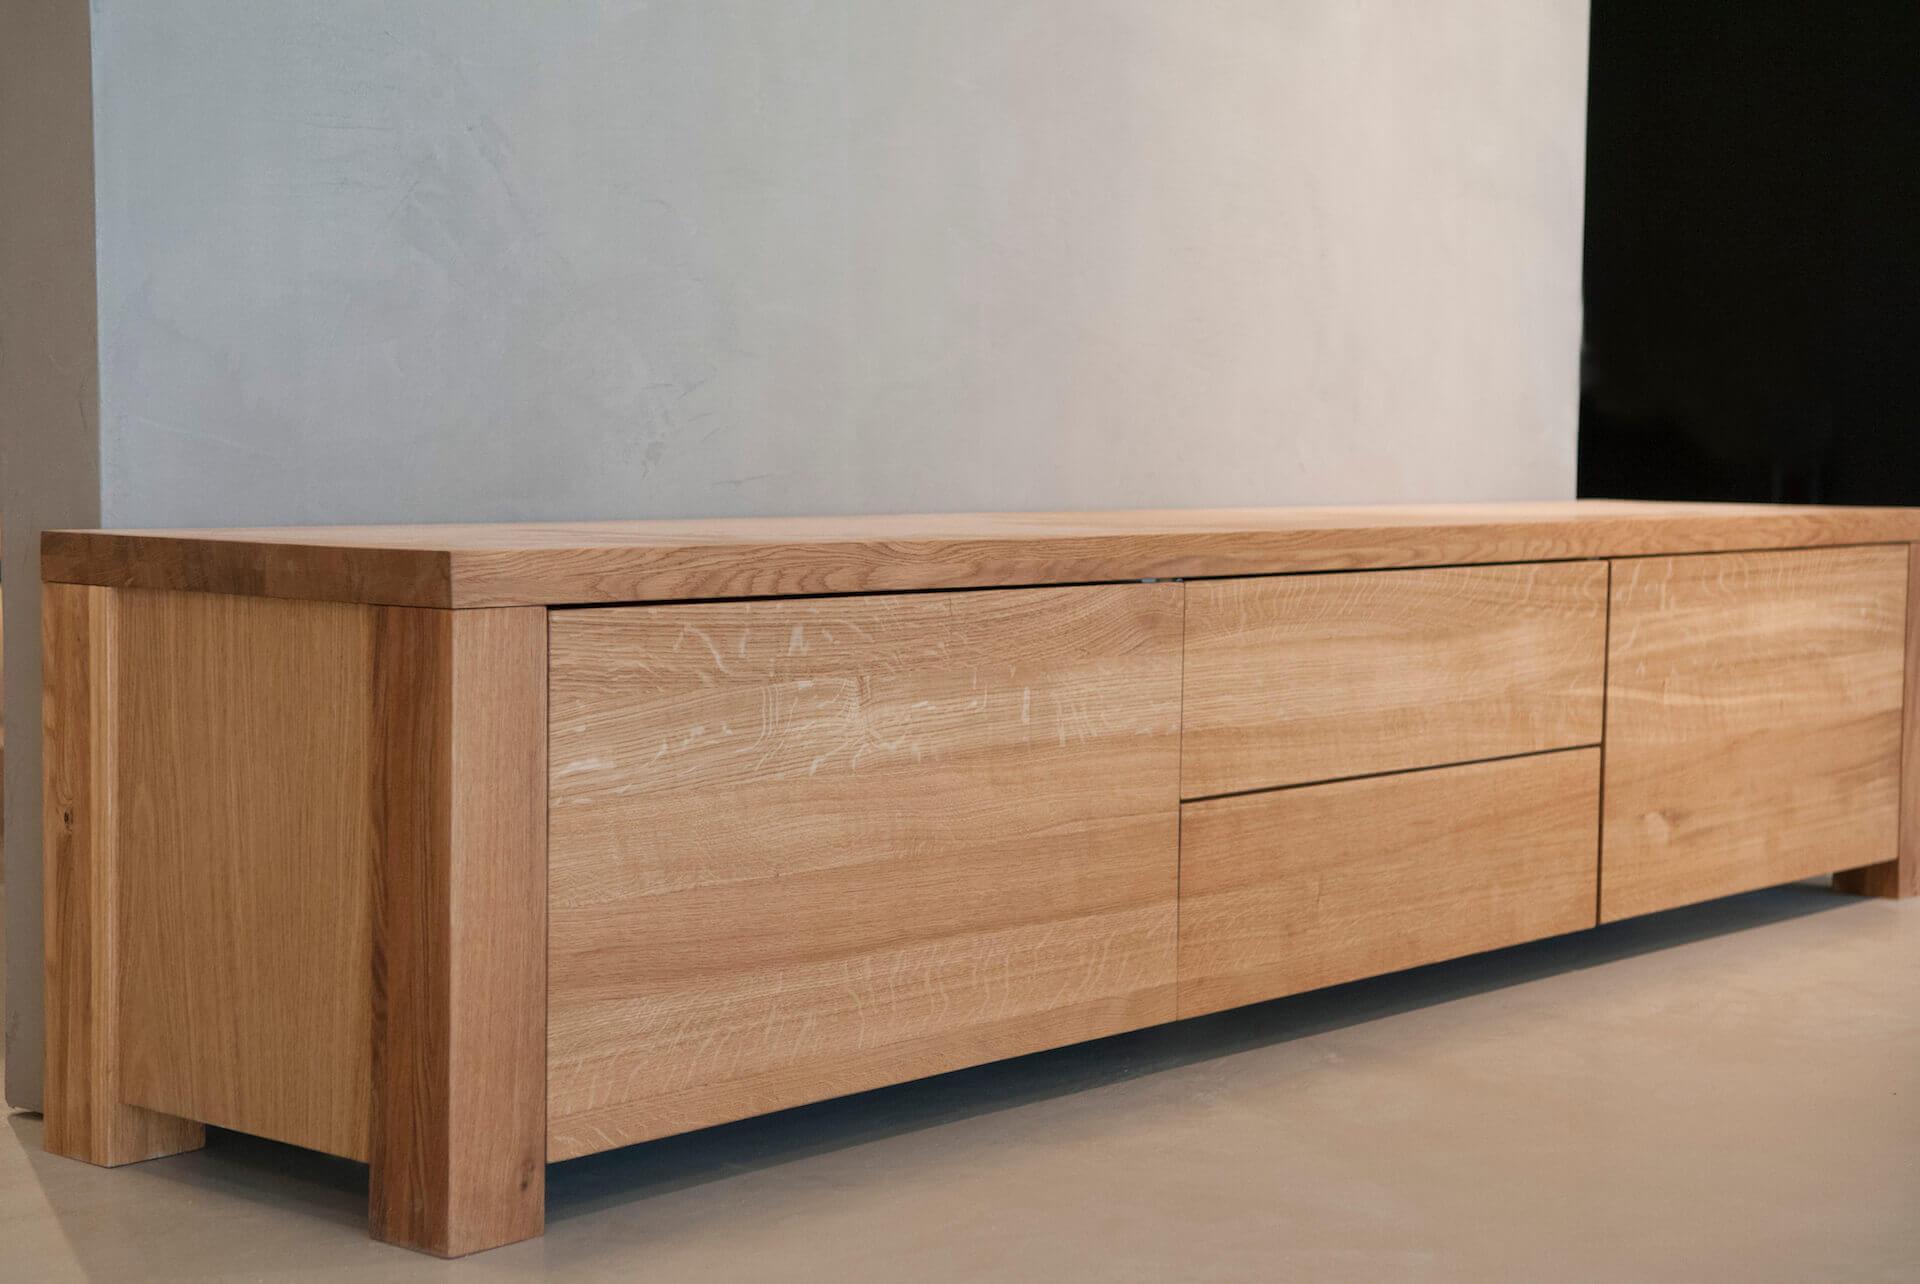 Eiken tv meubel sentenie ontwerp for Eiken tv meubel